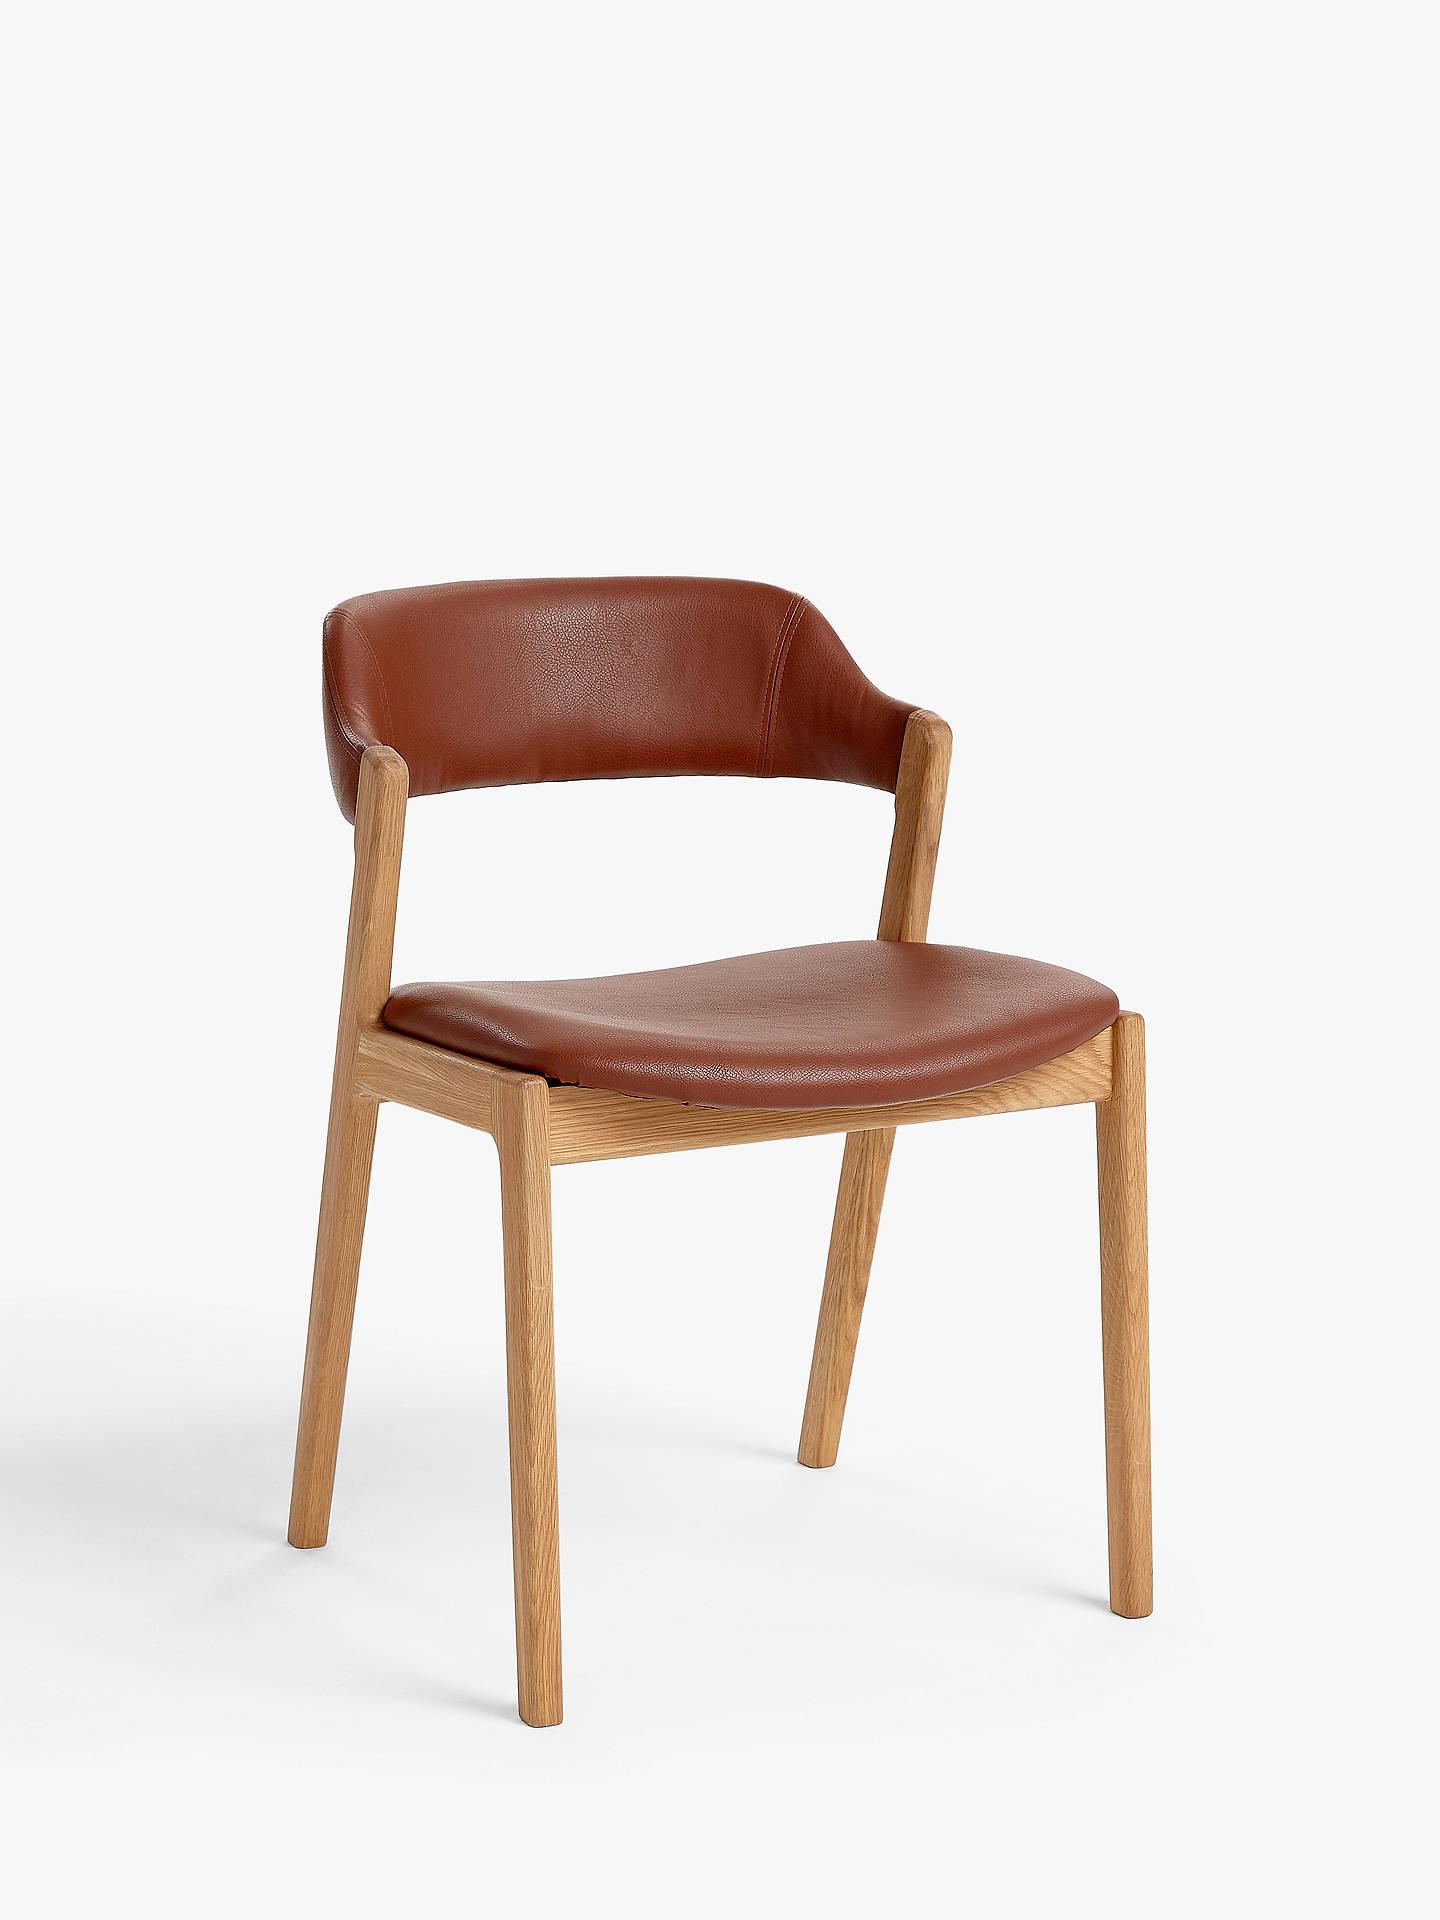 Amazing John Lewis Partners Santino Dining Chair Tan Oak Ibusinesslaw Wood Chair Design Ideas Ibusinesslaworg